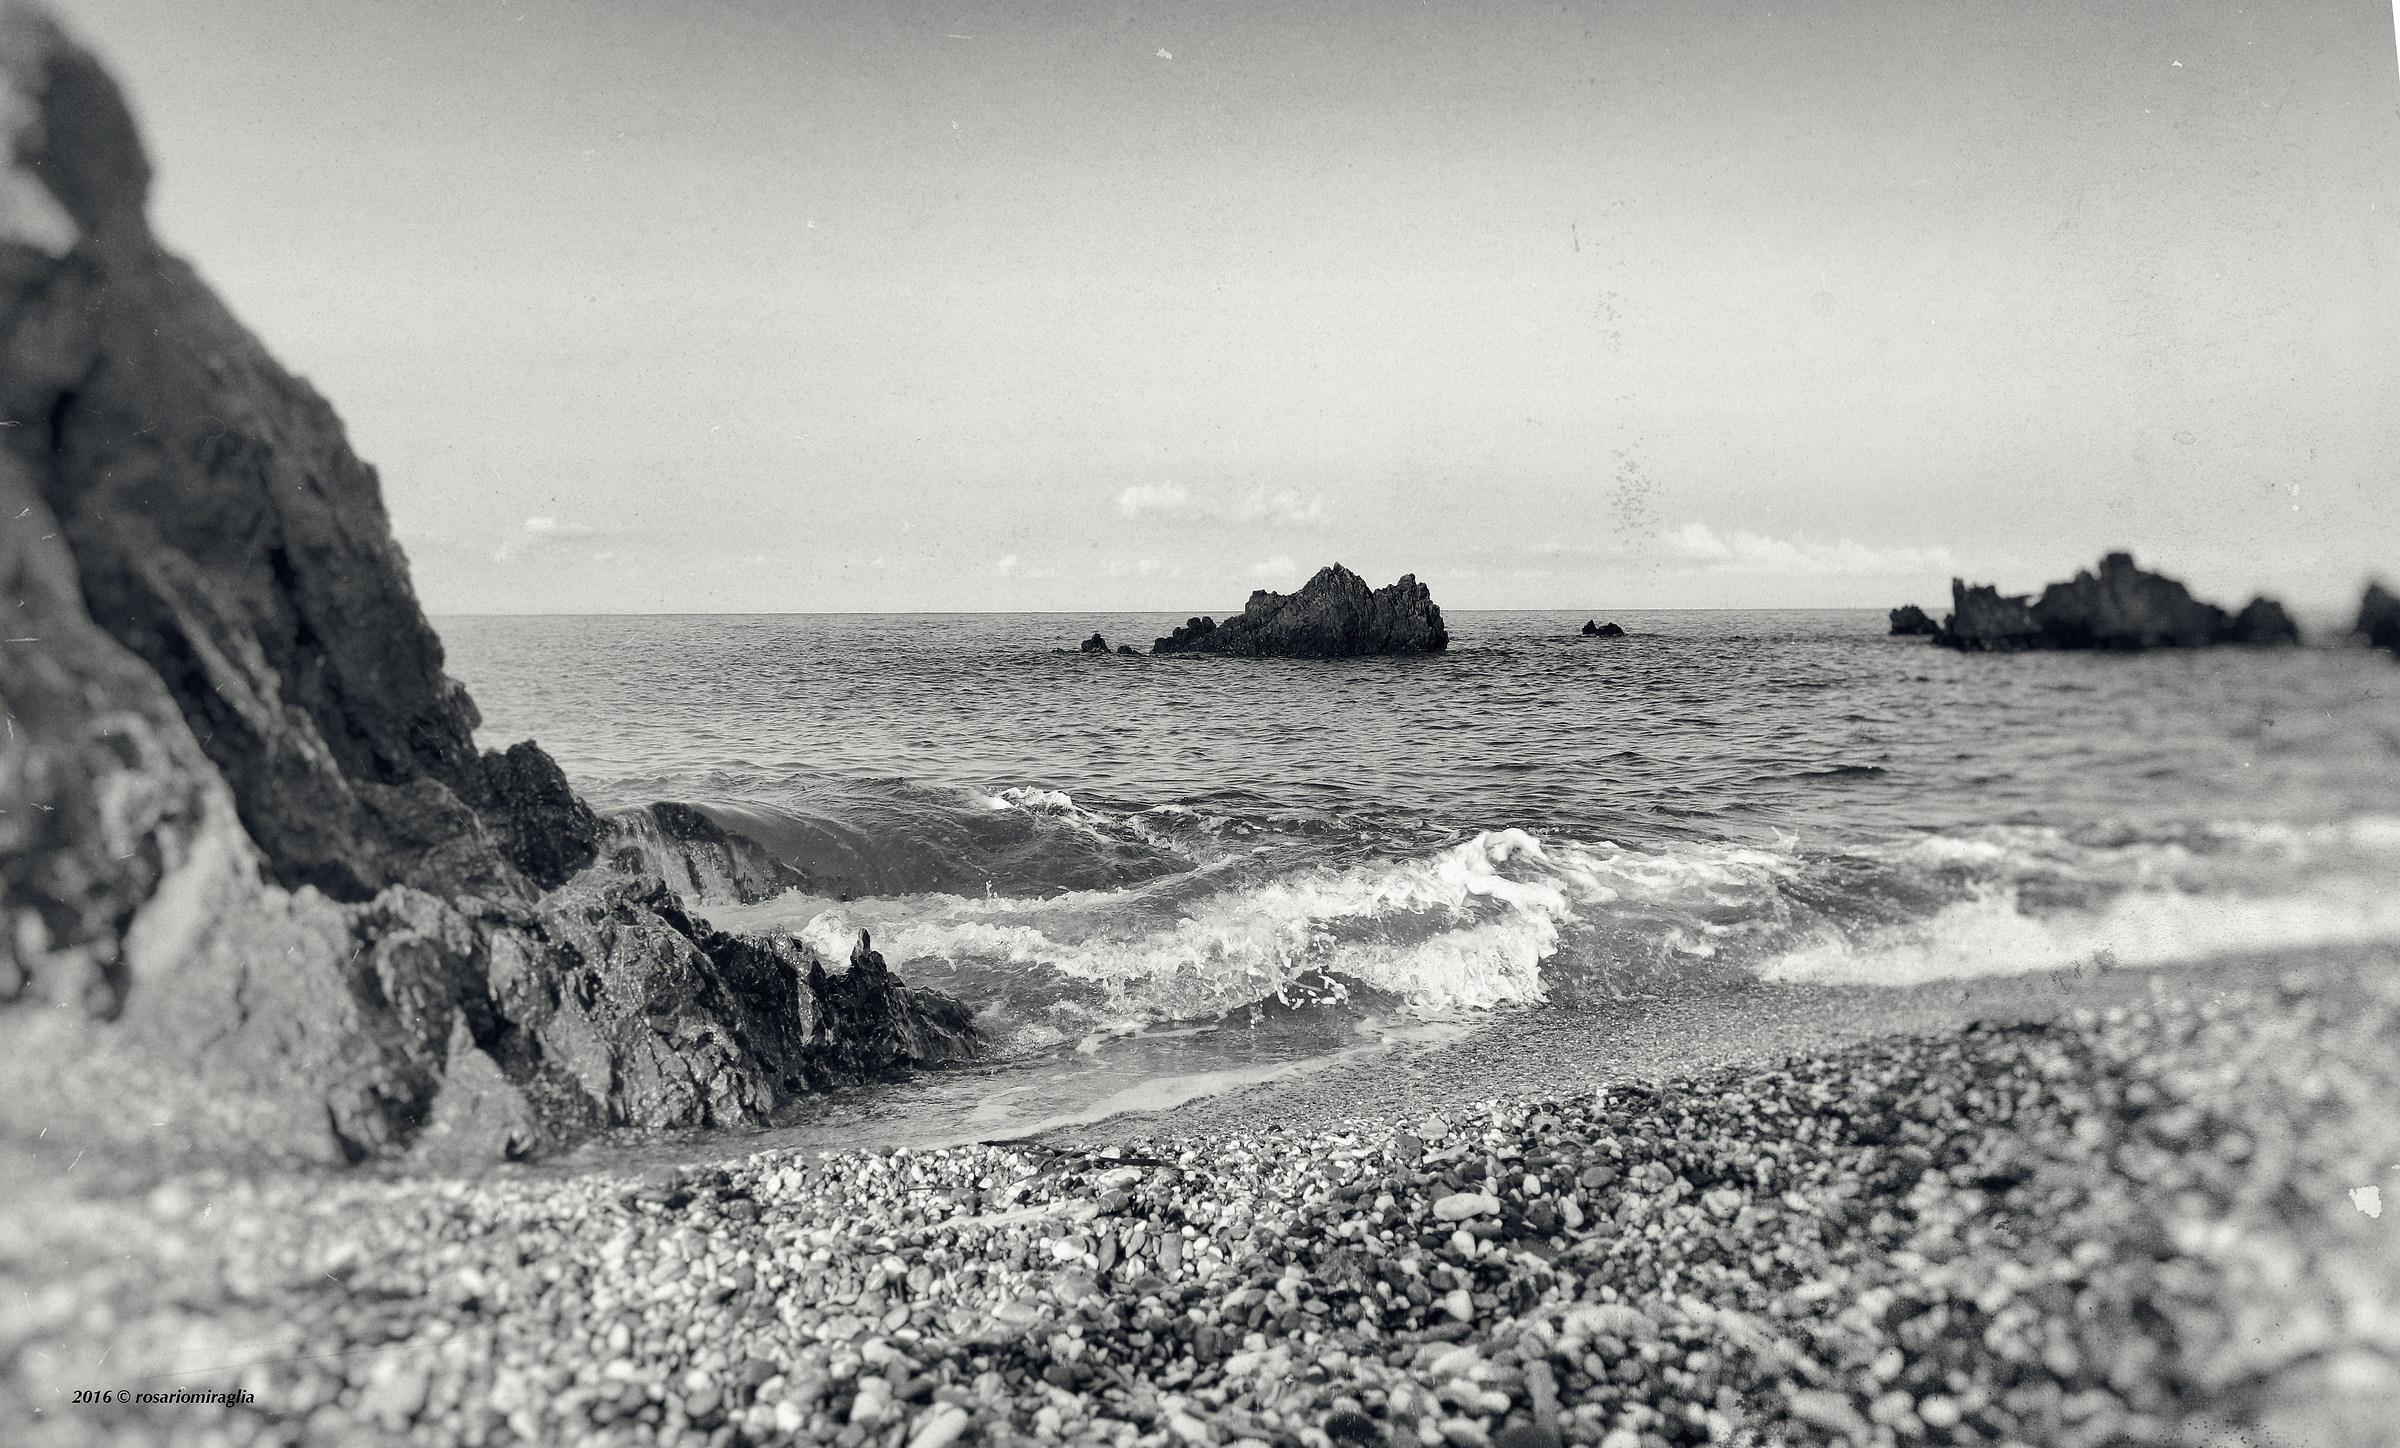 alone ... the rocks ......